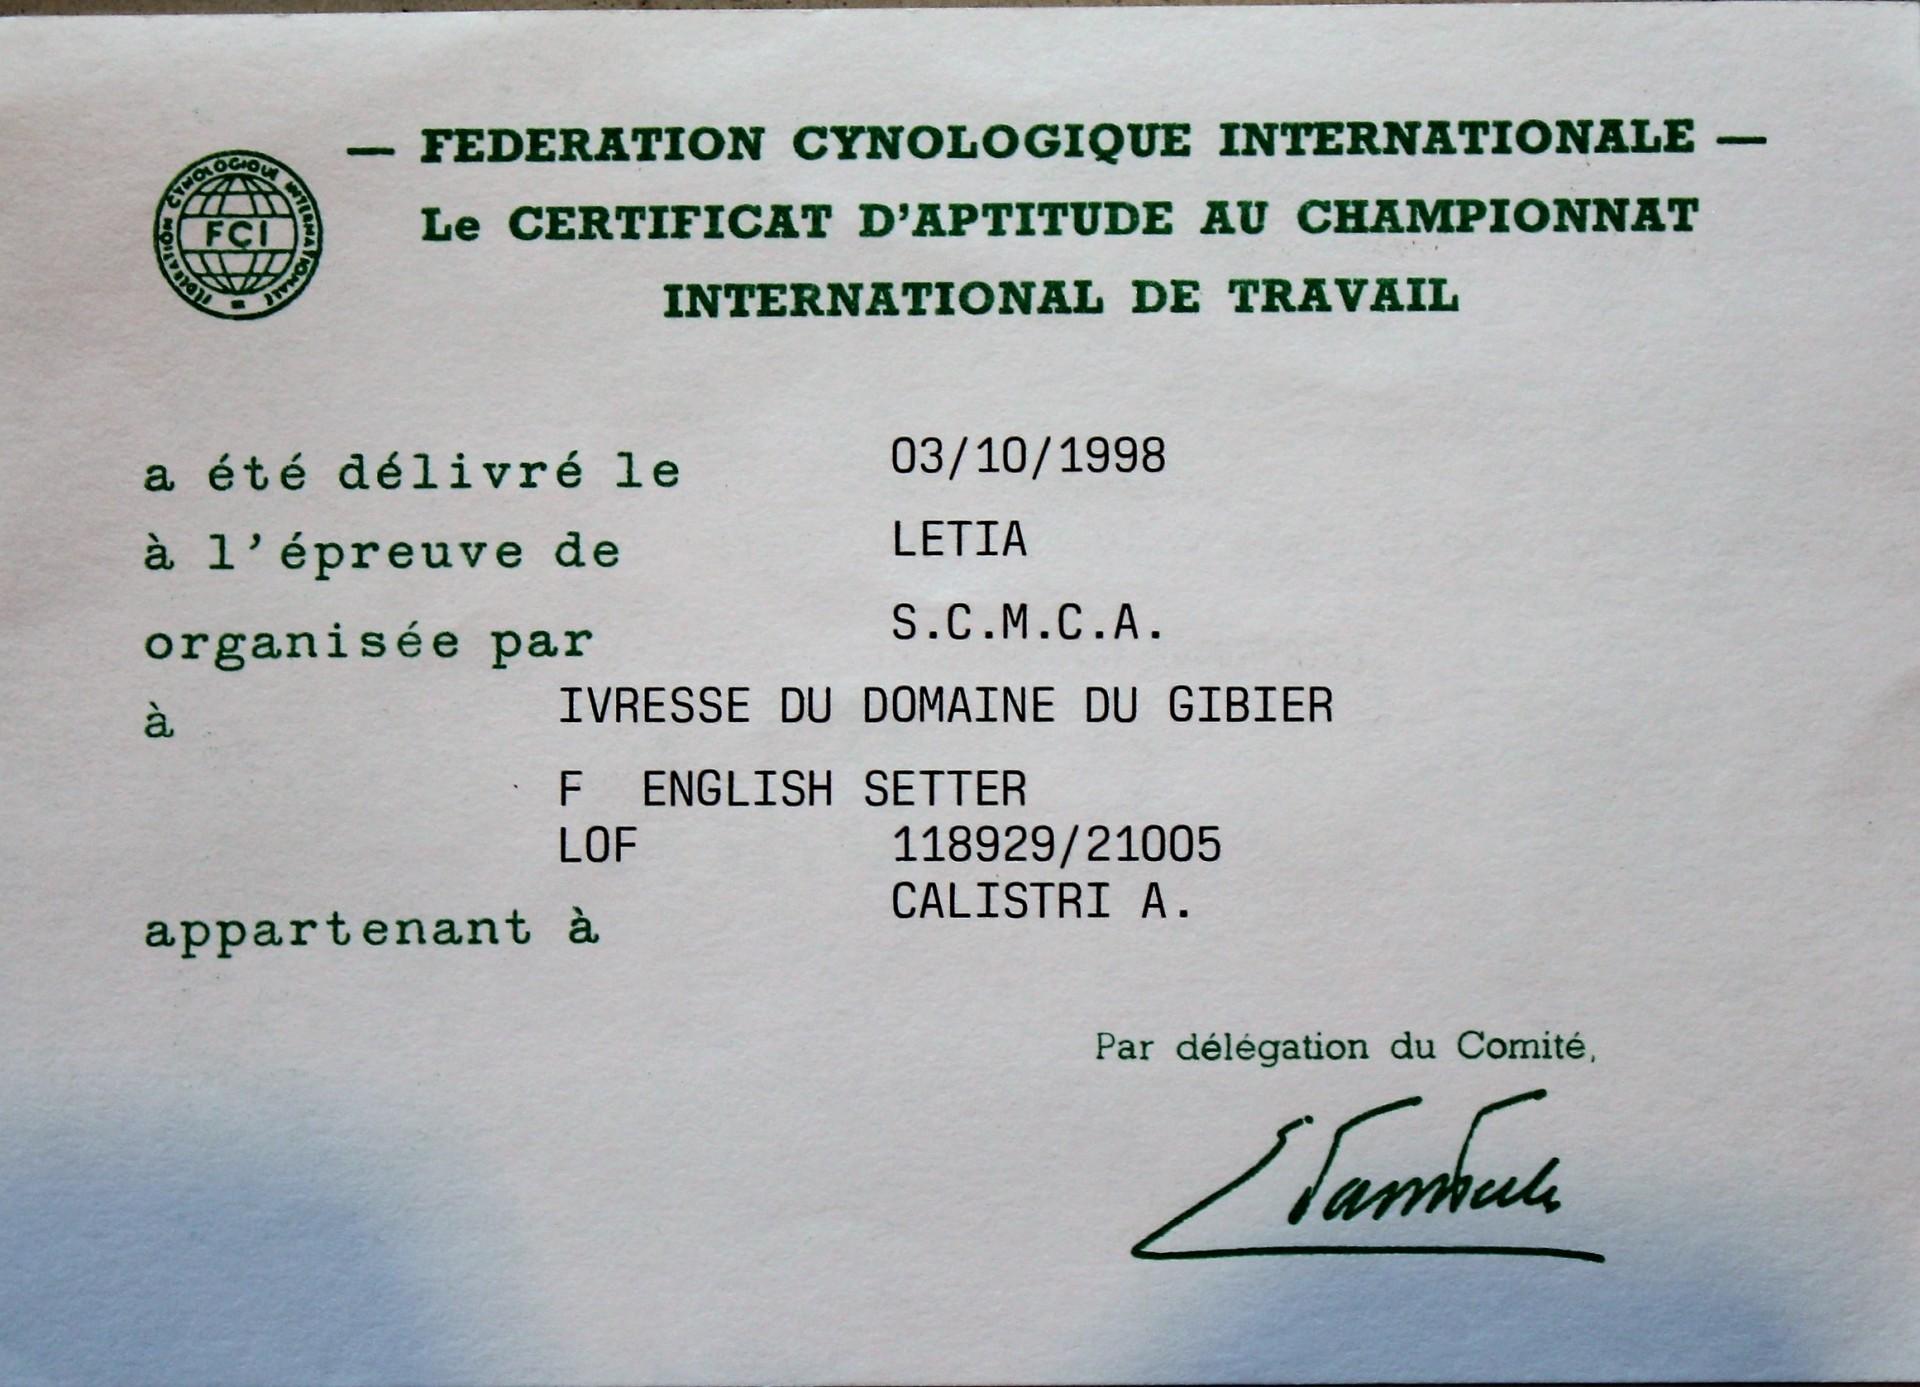 certificat-daptitude-championnat-international-de-travail